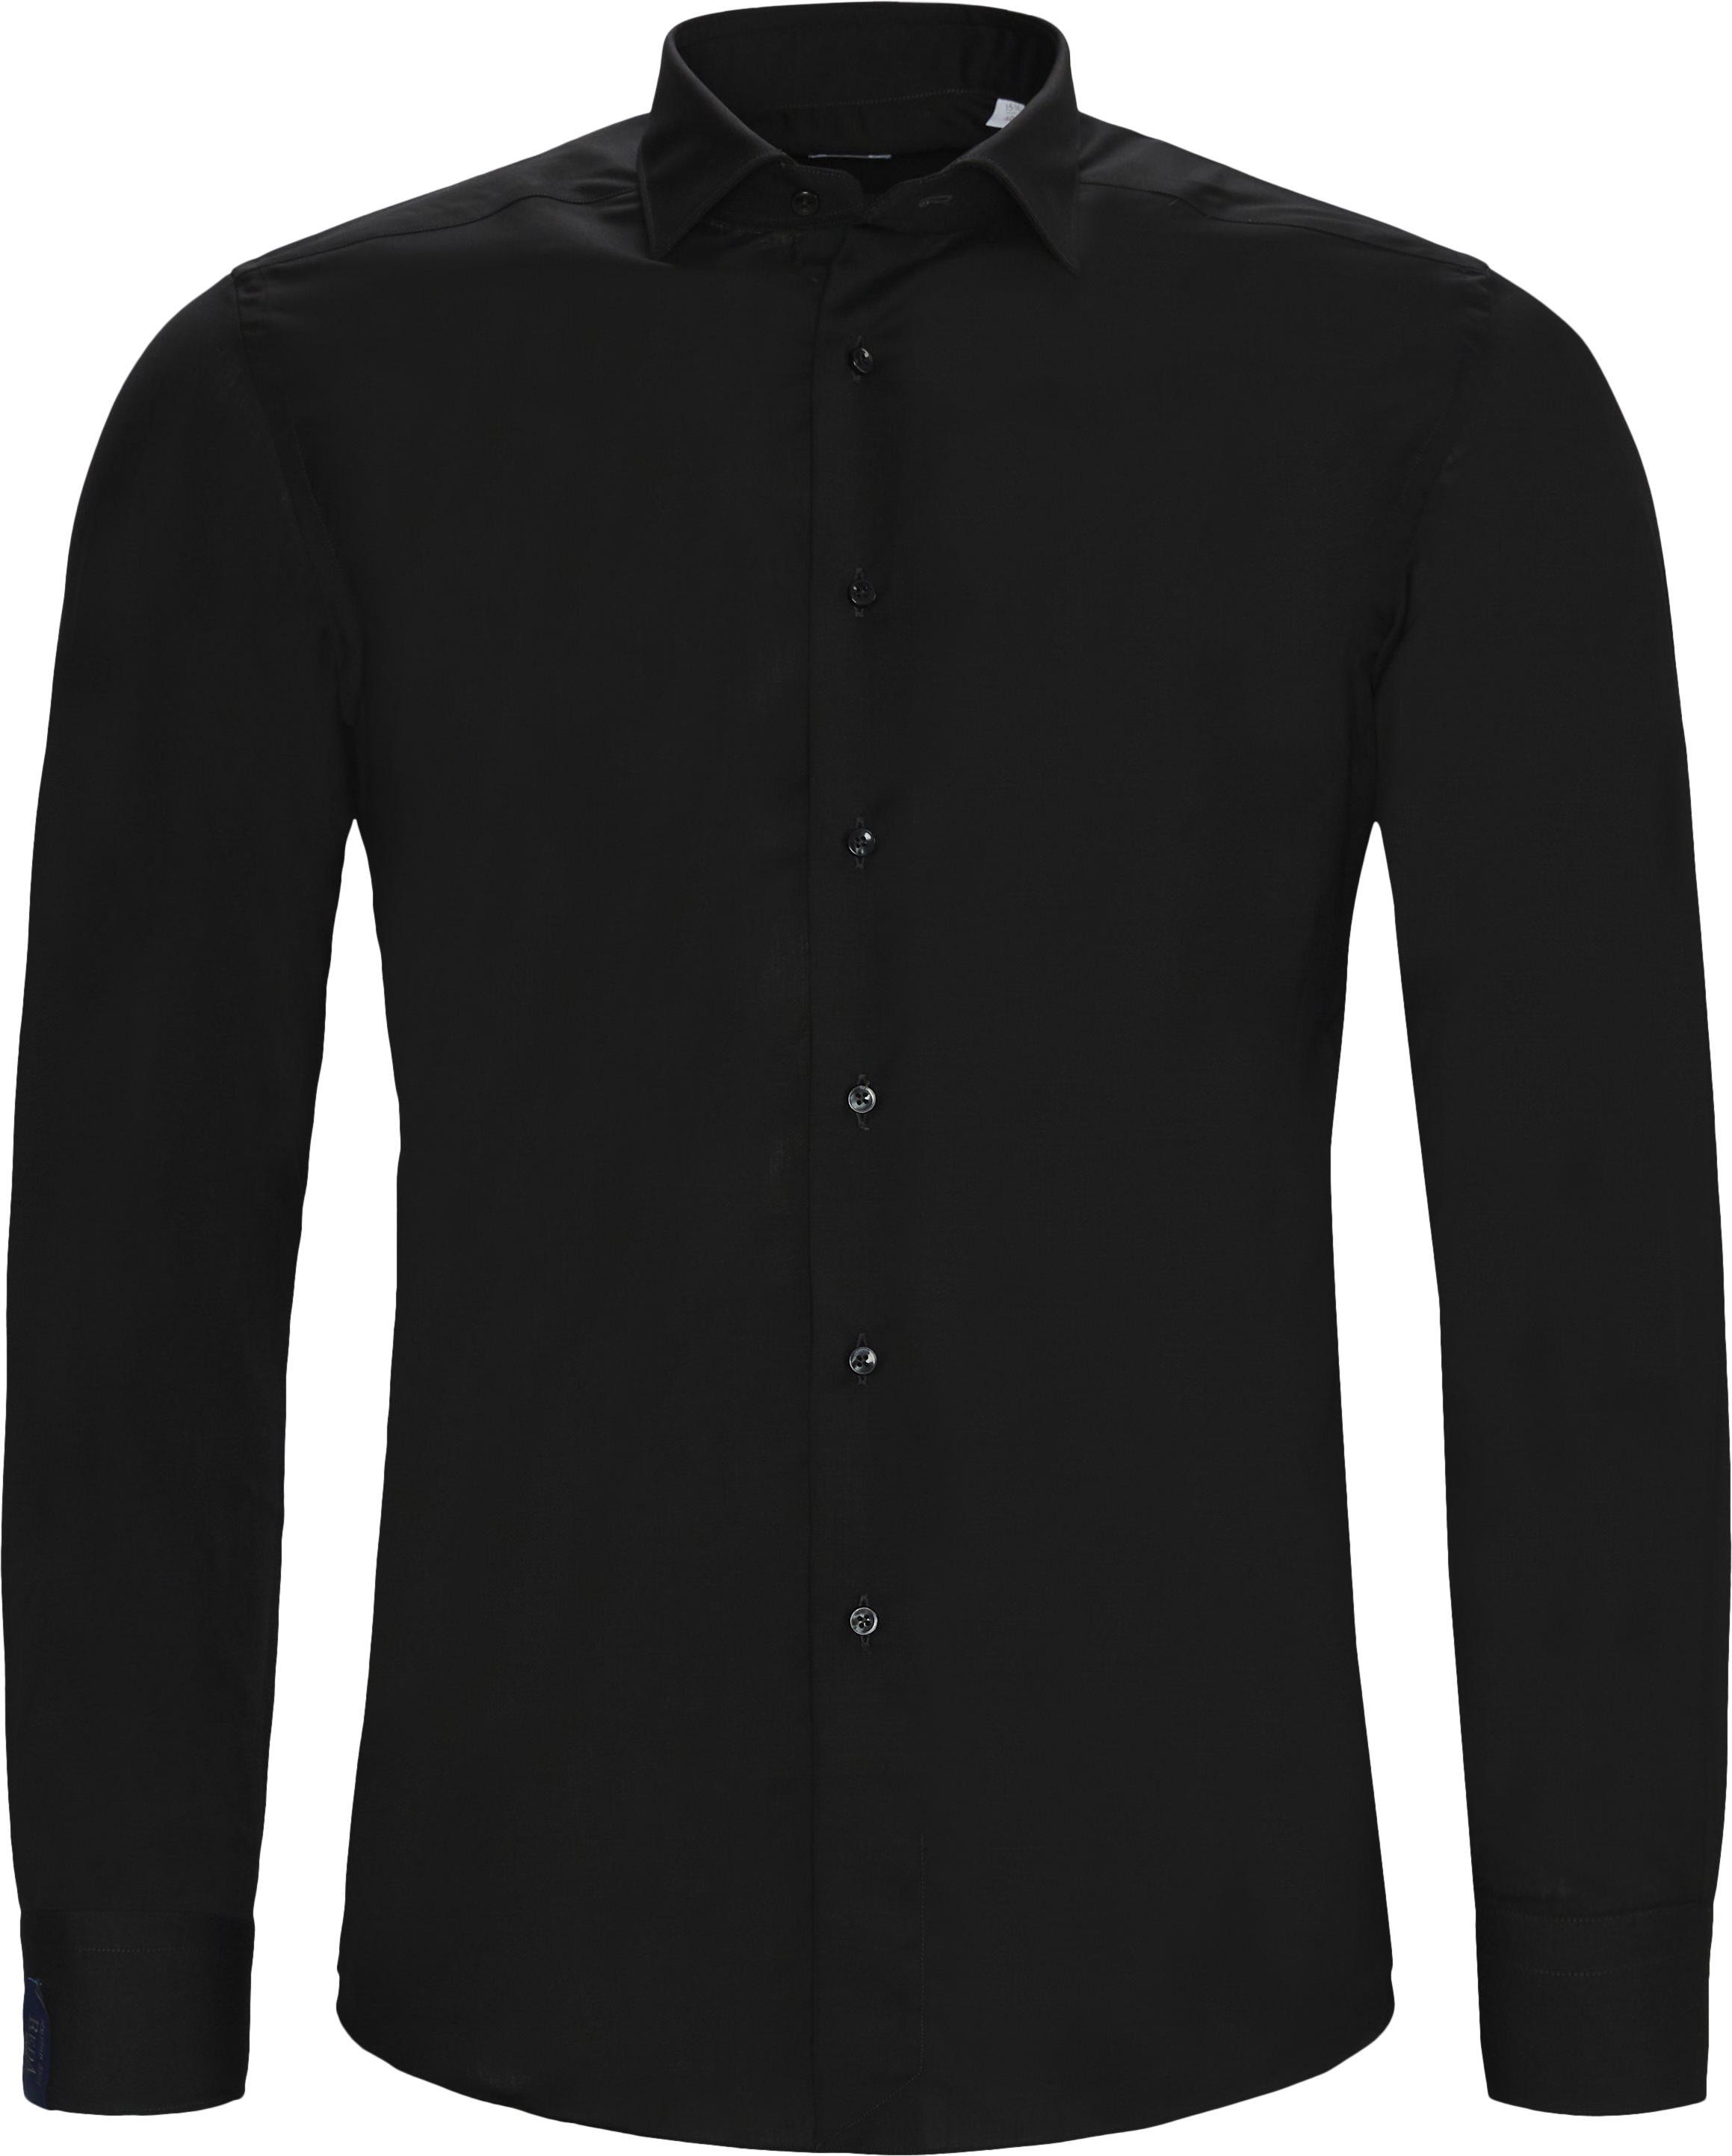 Skjorter - Contemporary fit - Sort